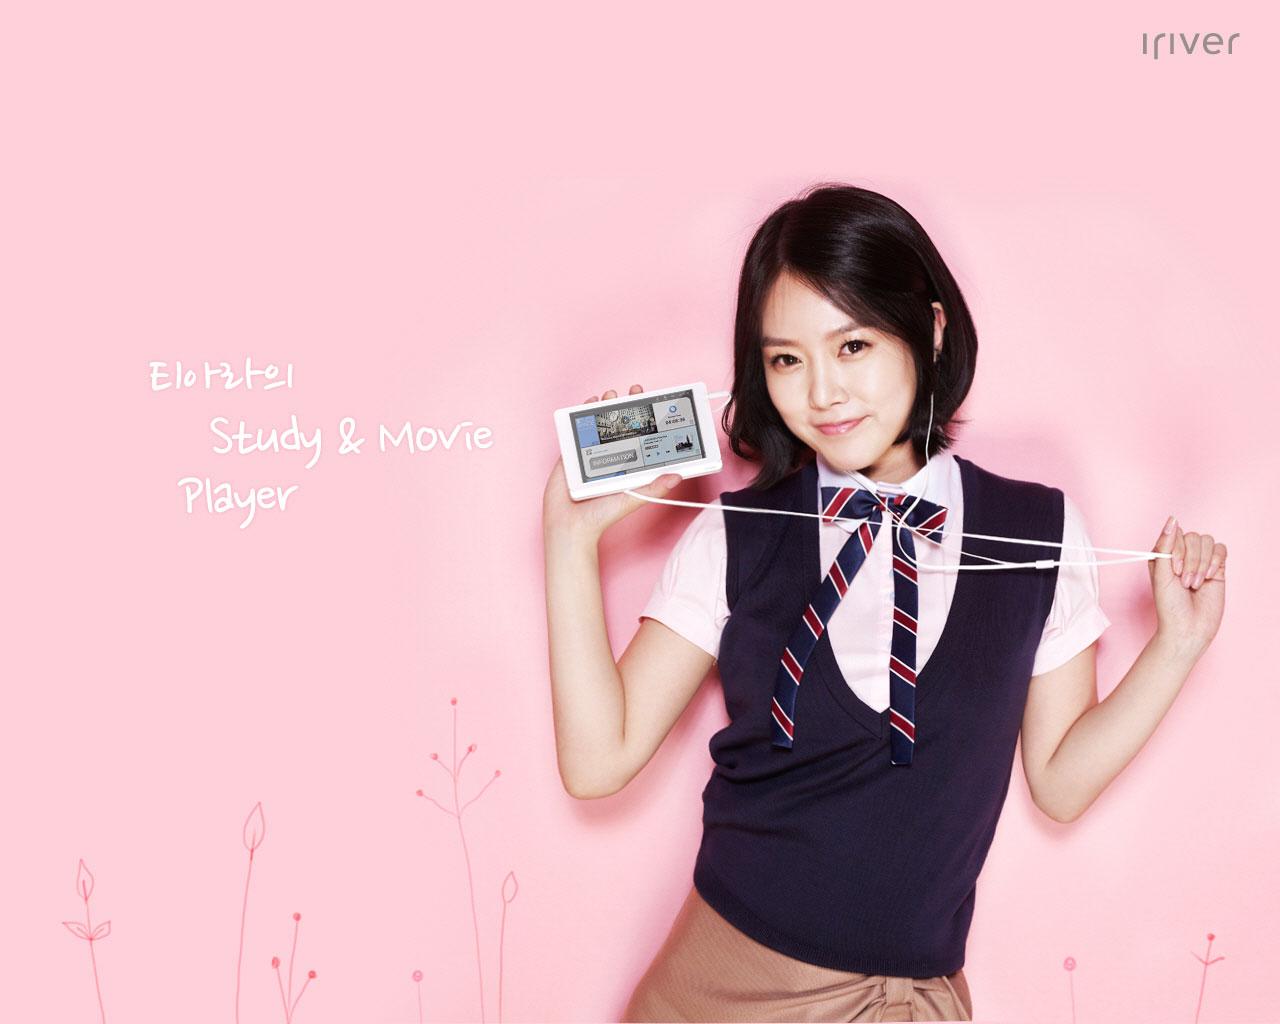 T-ara SoYeon Iriver wallpaper